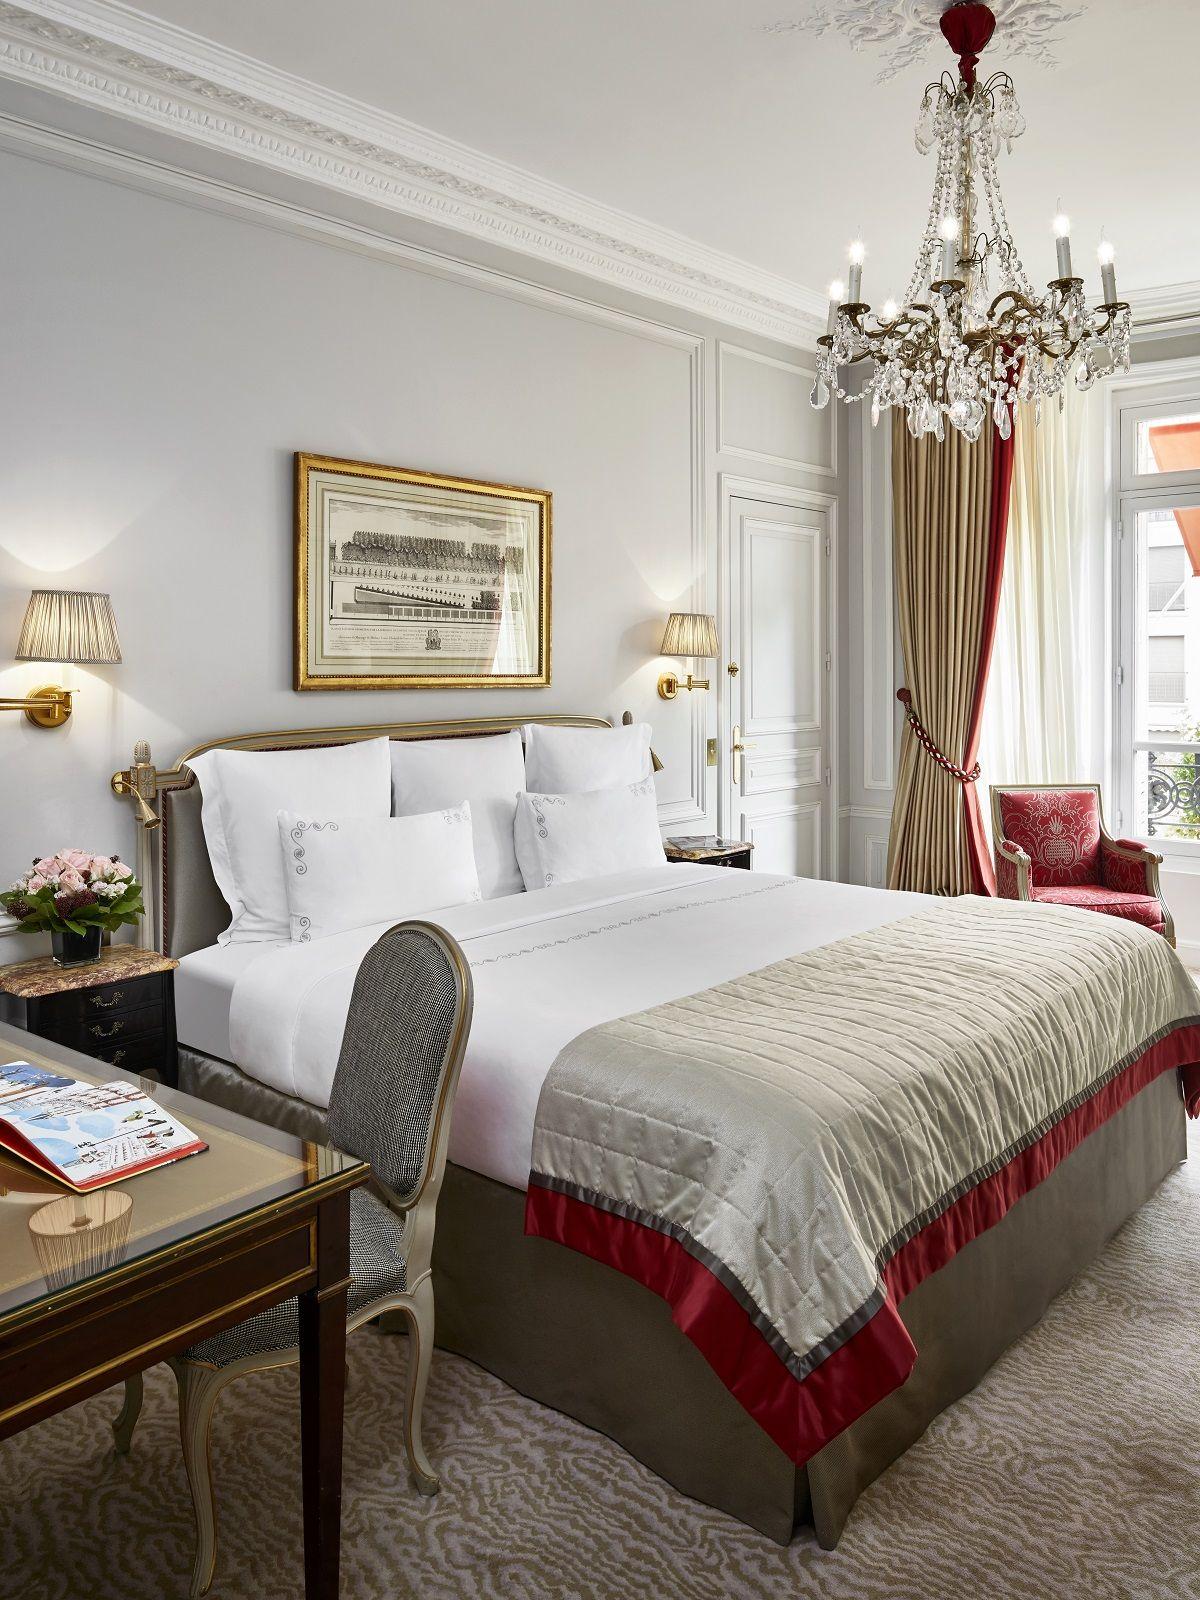 7 Star Hotel Rooms: Avenue Montaigne View At Hôtel Plaza Athénée